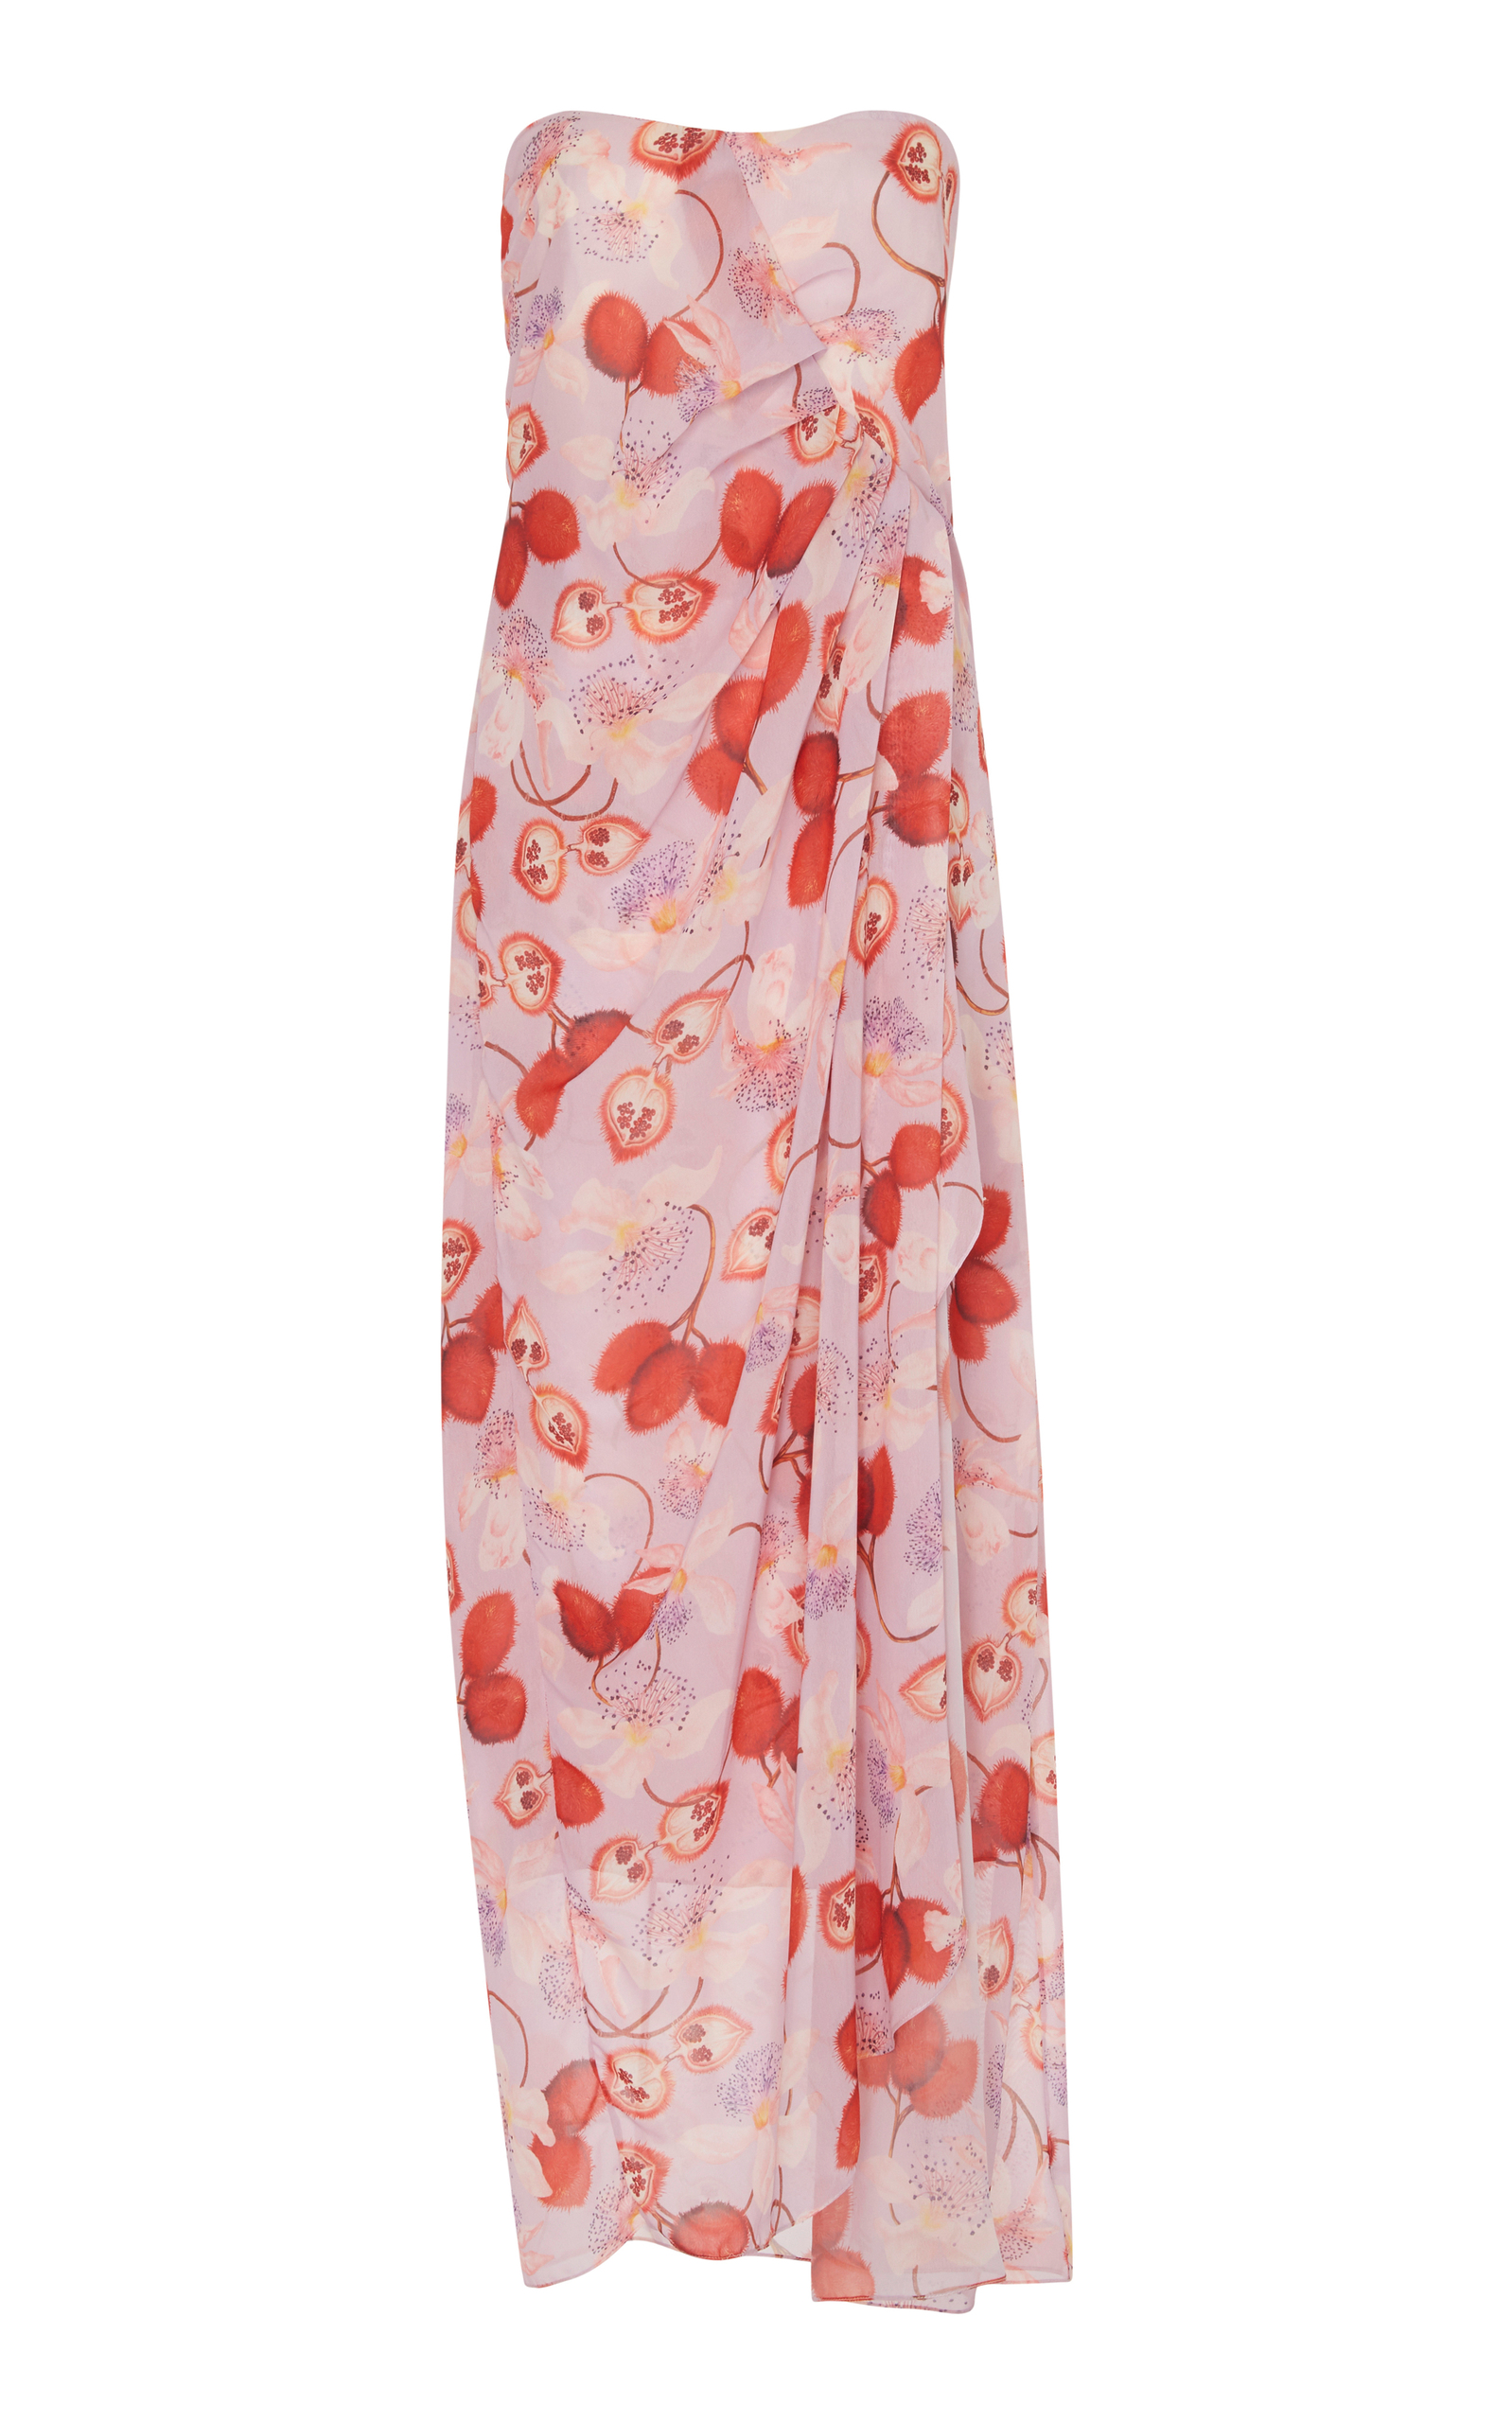 Bela Maxi Dress in Pink